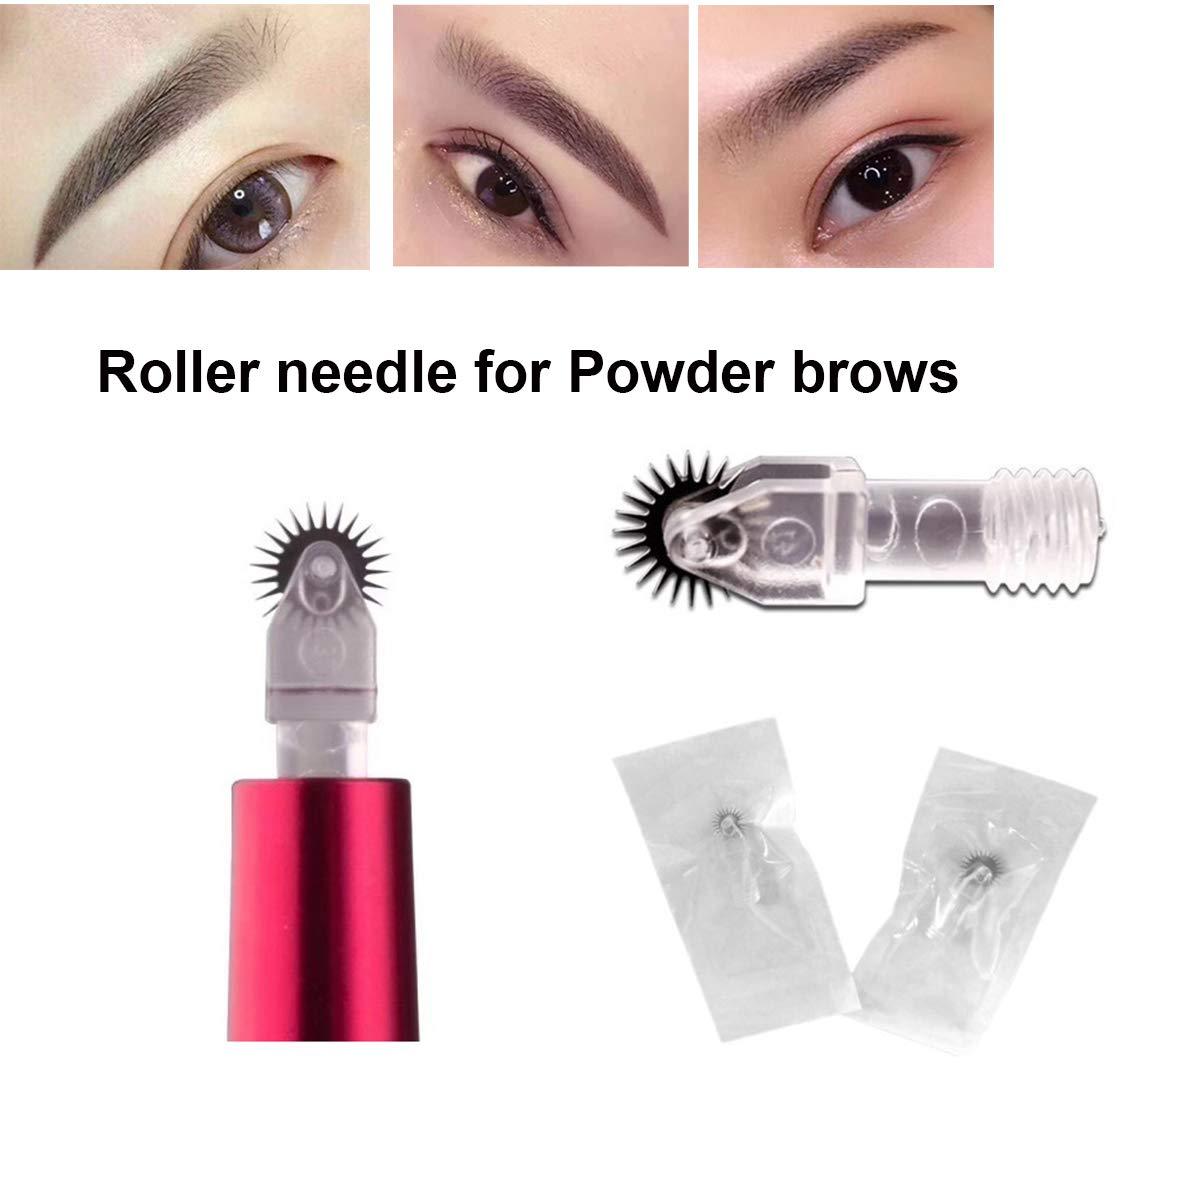 Guapa 20pcs Microblading Needles 7mm Permanent Makeup Fog Shading Needles Fast Coloring Roller Pins for Eyebrow Beauty (7mm-20pcs)